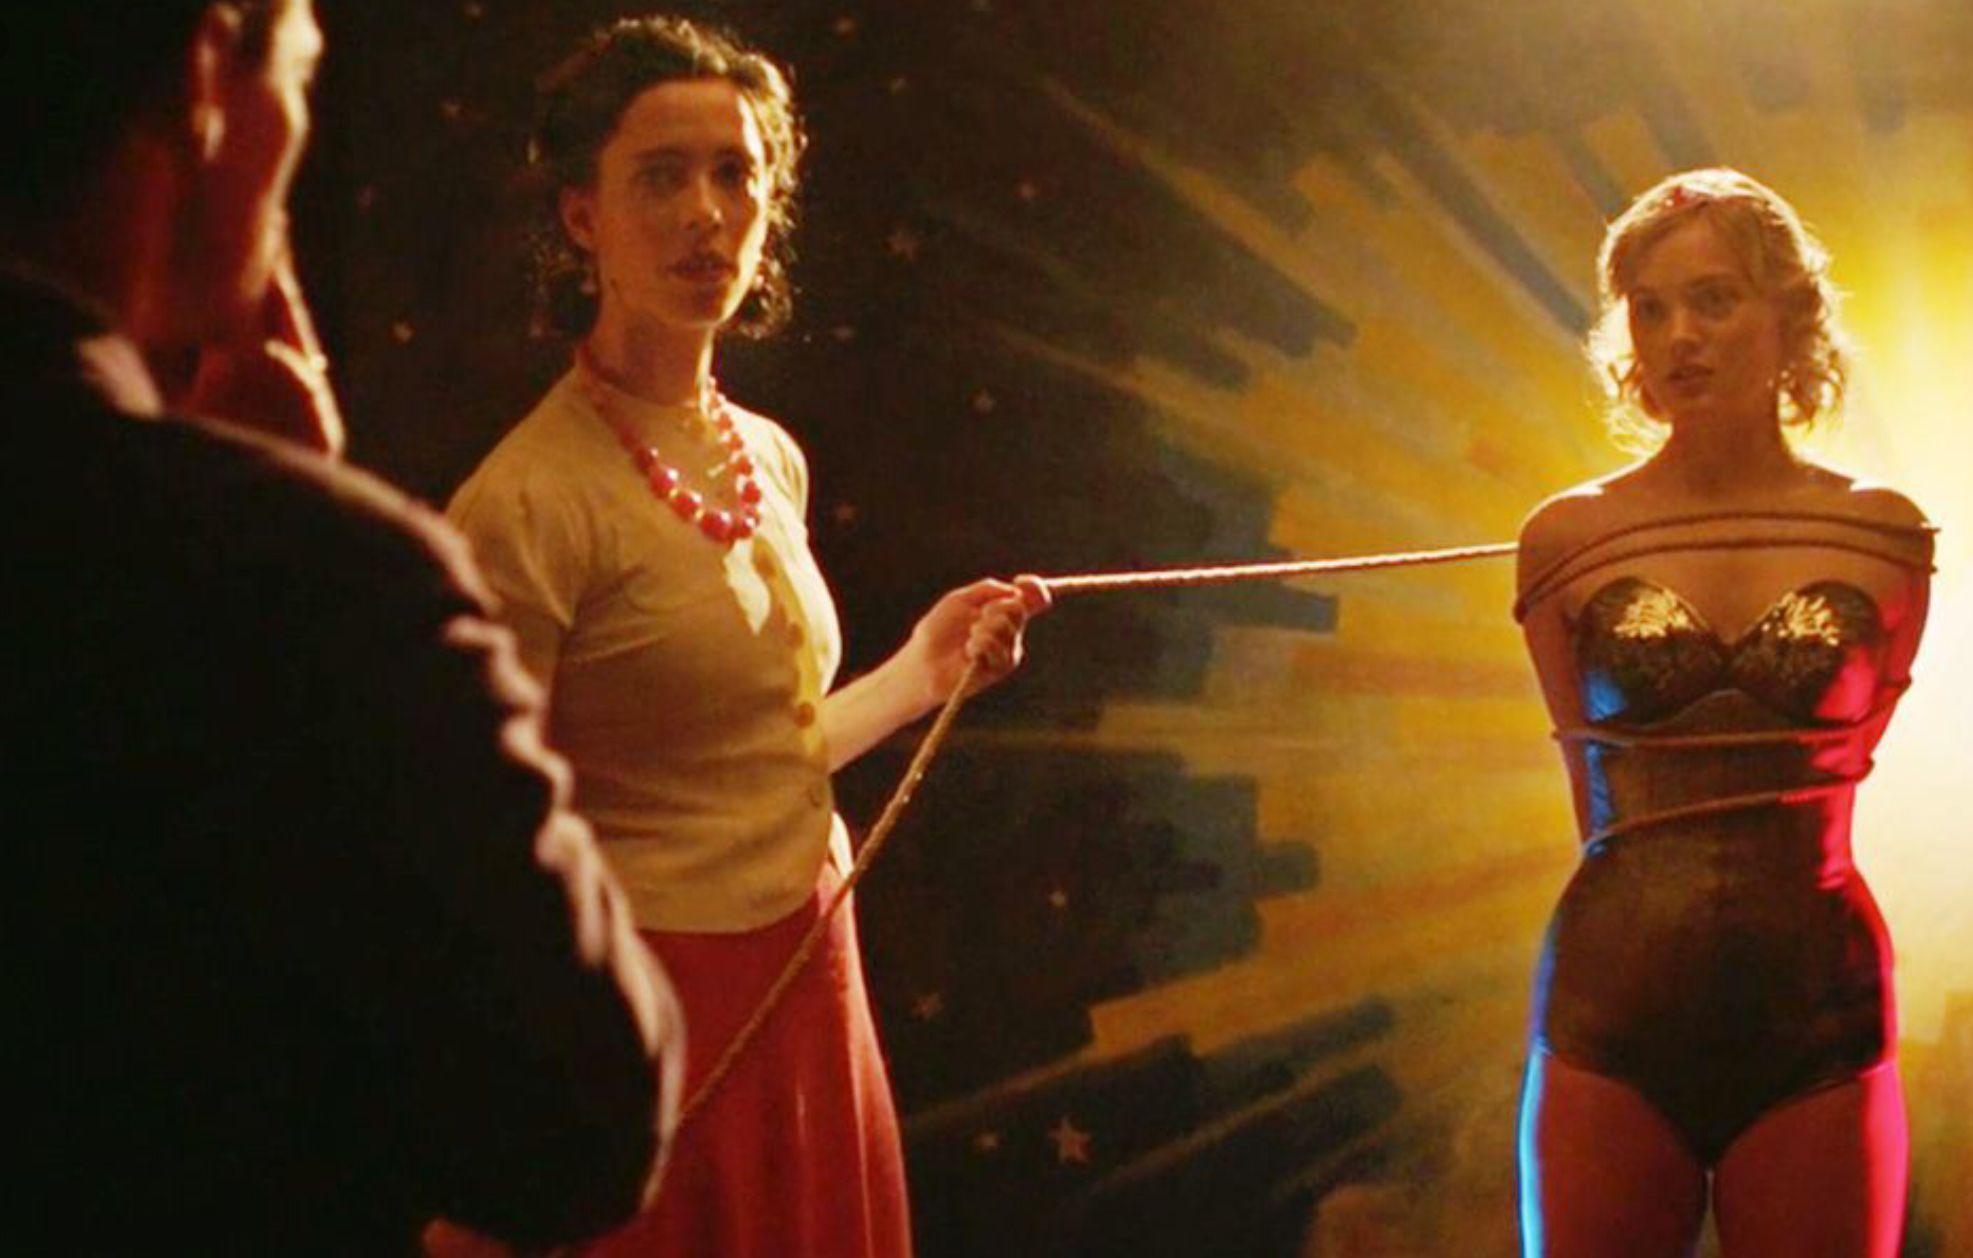 Professor Marston And The Wonder Women Wonder Woman Movie Couples Best Actor